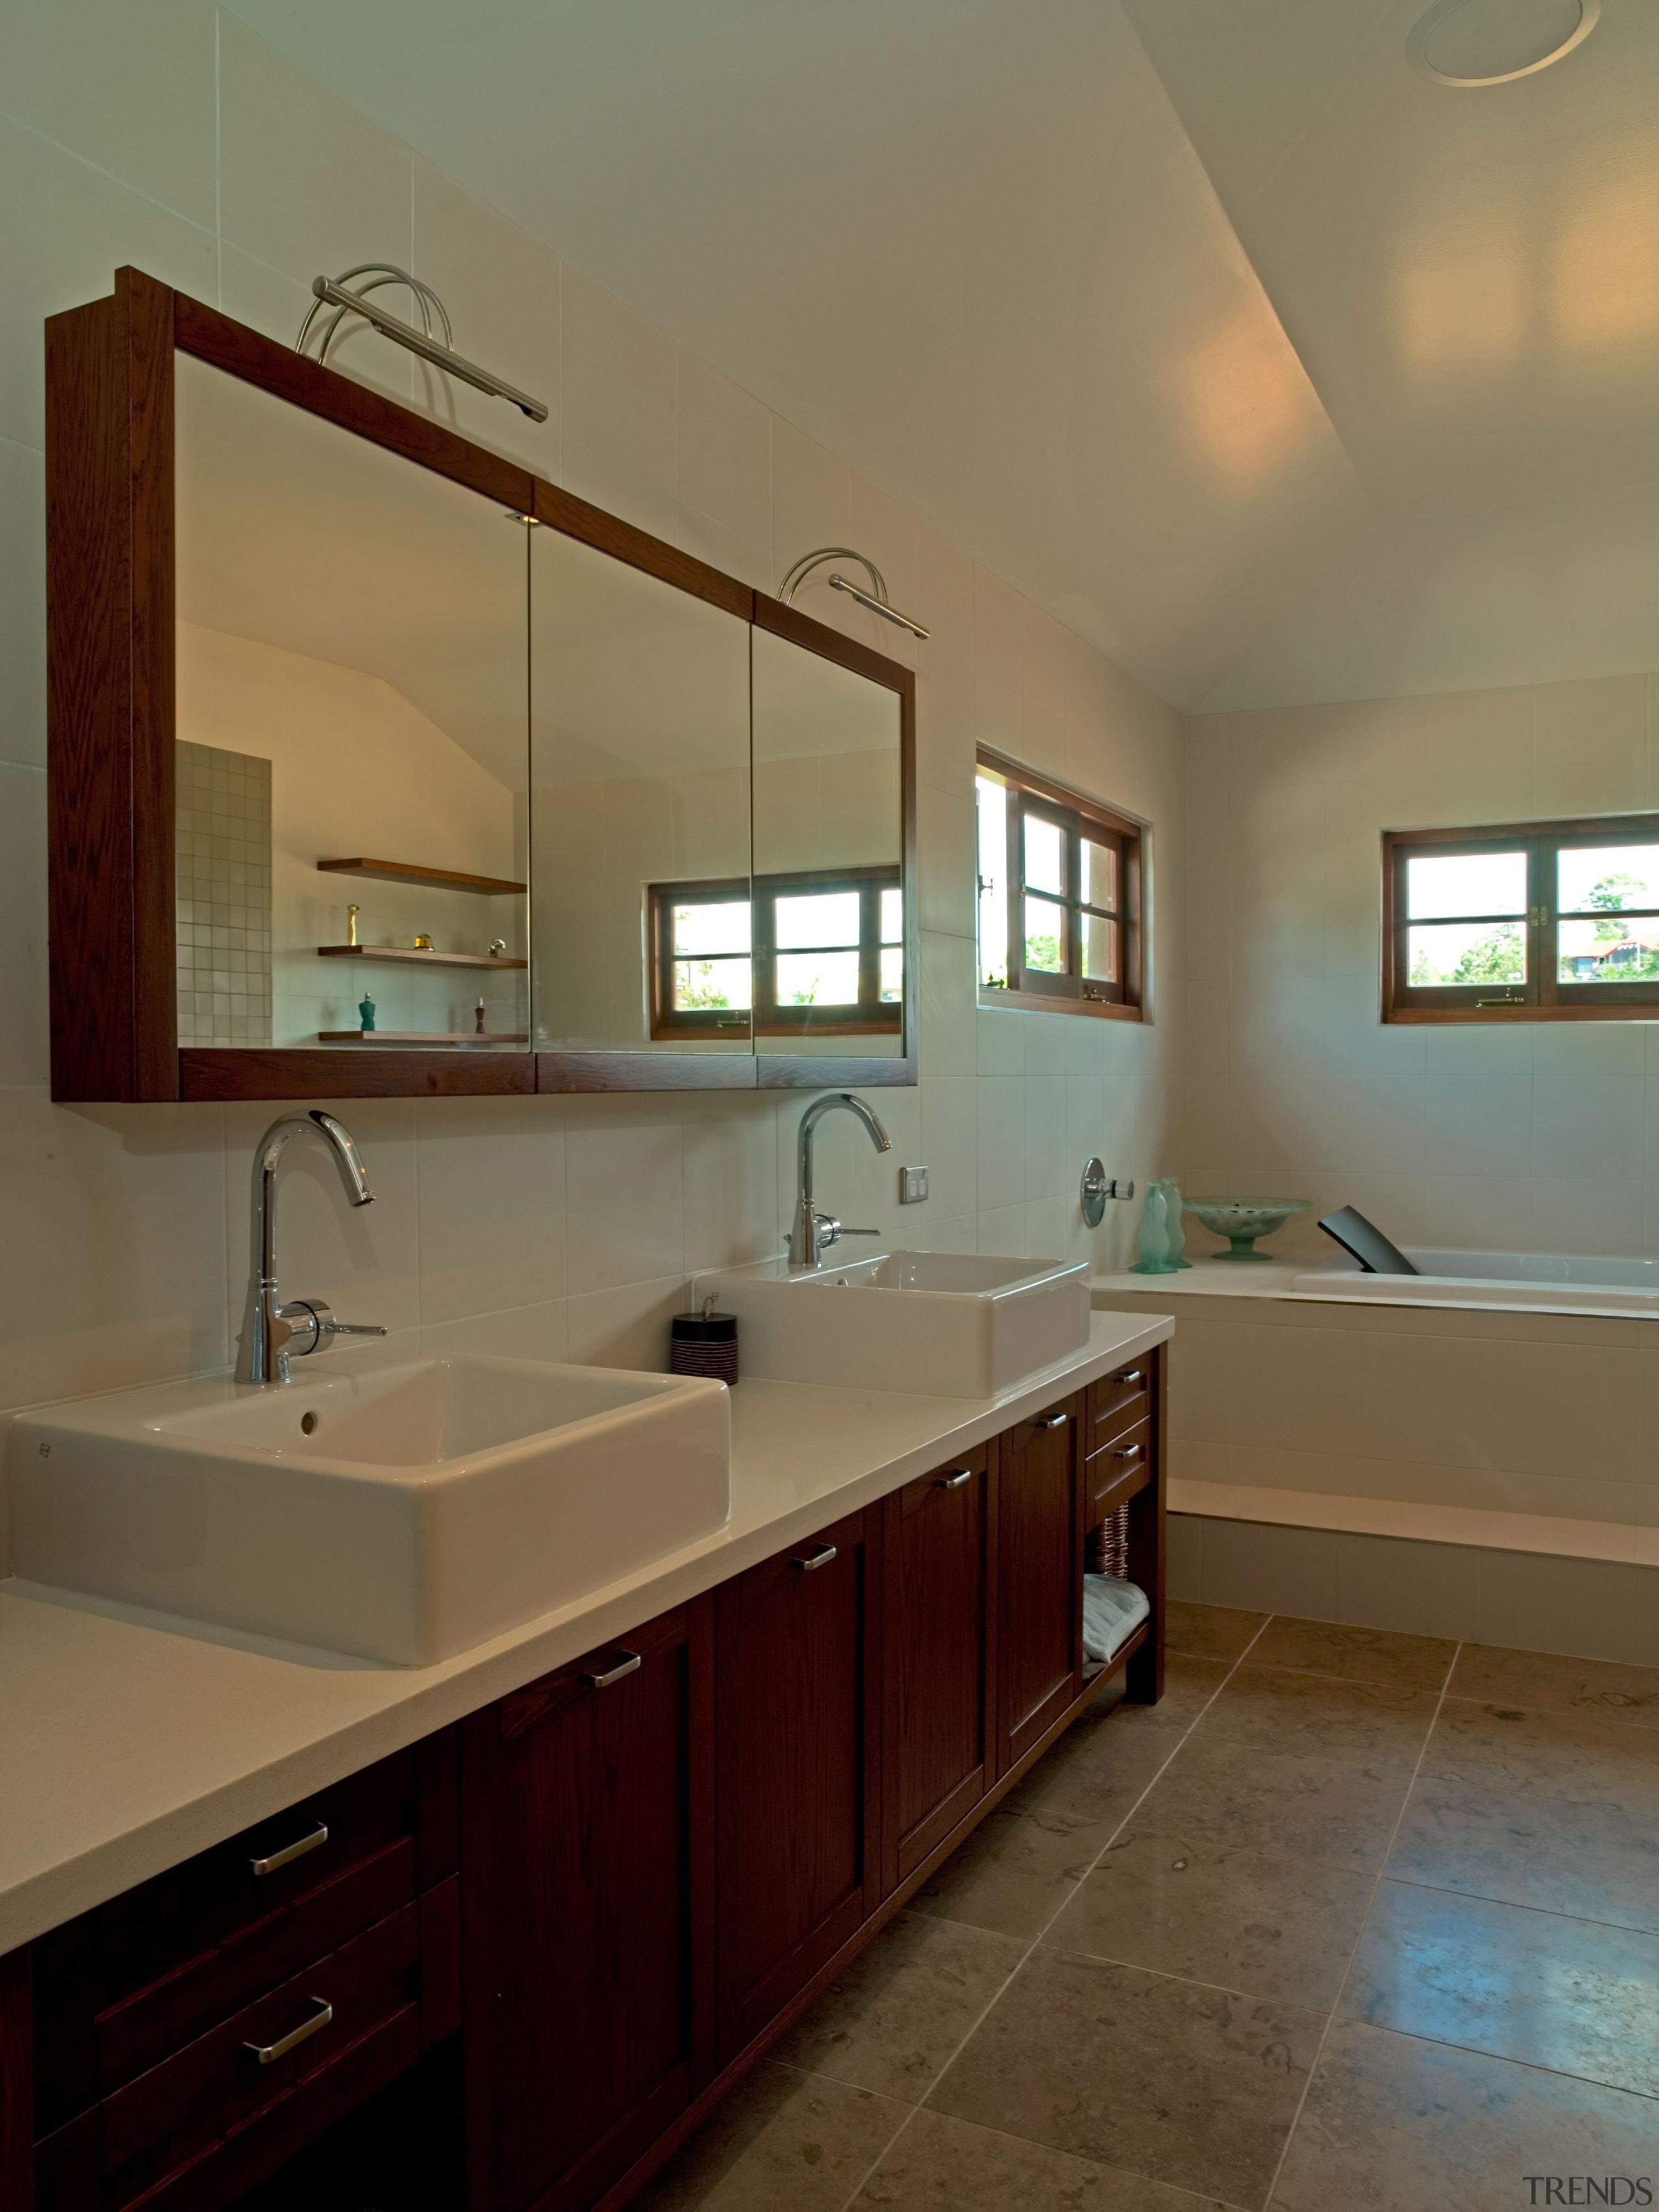 139 onetaunga ensuite - Onetaunga Ensuite - bathroom bathroom, cabinetry, ceiling, countertop, floor, home, interior design, kitchen, real estate, room, sink, brown